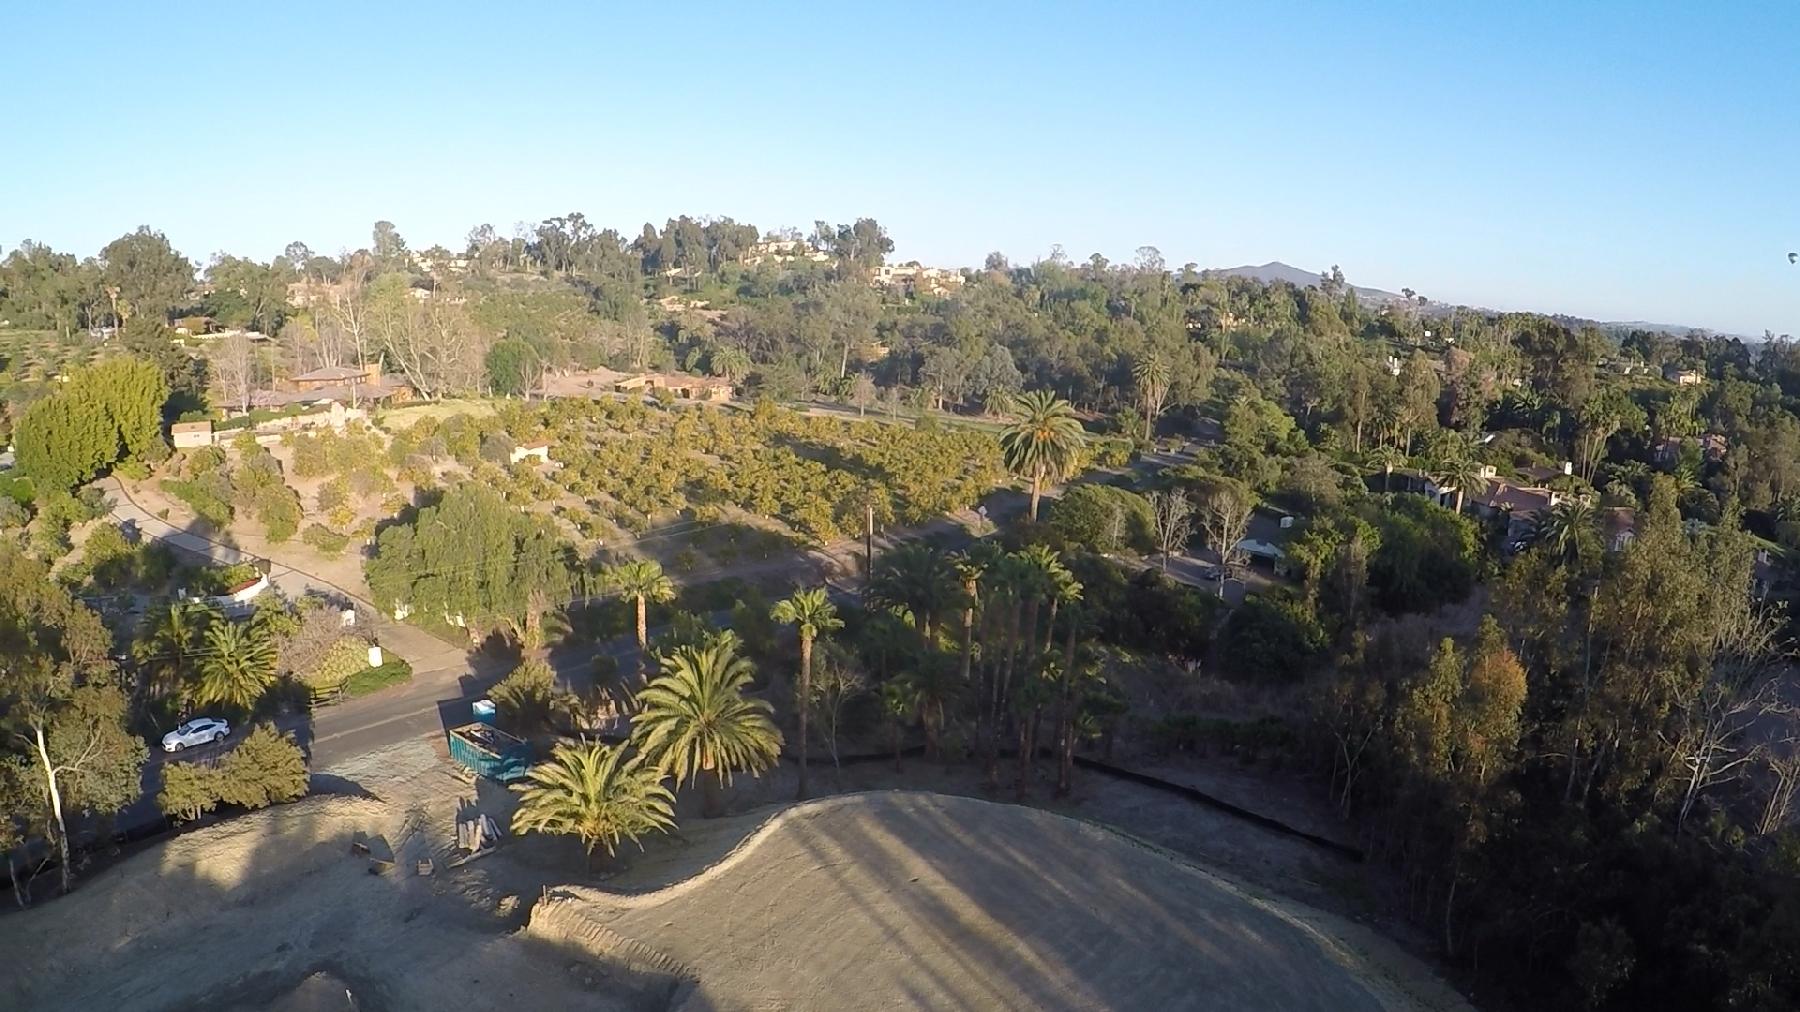 Land for Sale at Las Colinas 6557 Las Colinas Rancho Santa Fe, California, 92067 United States